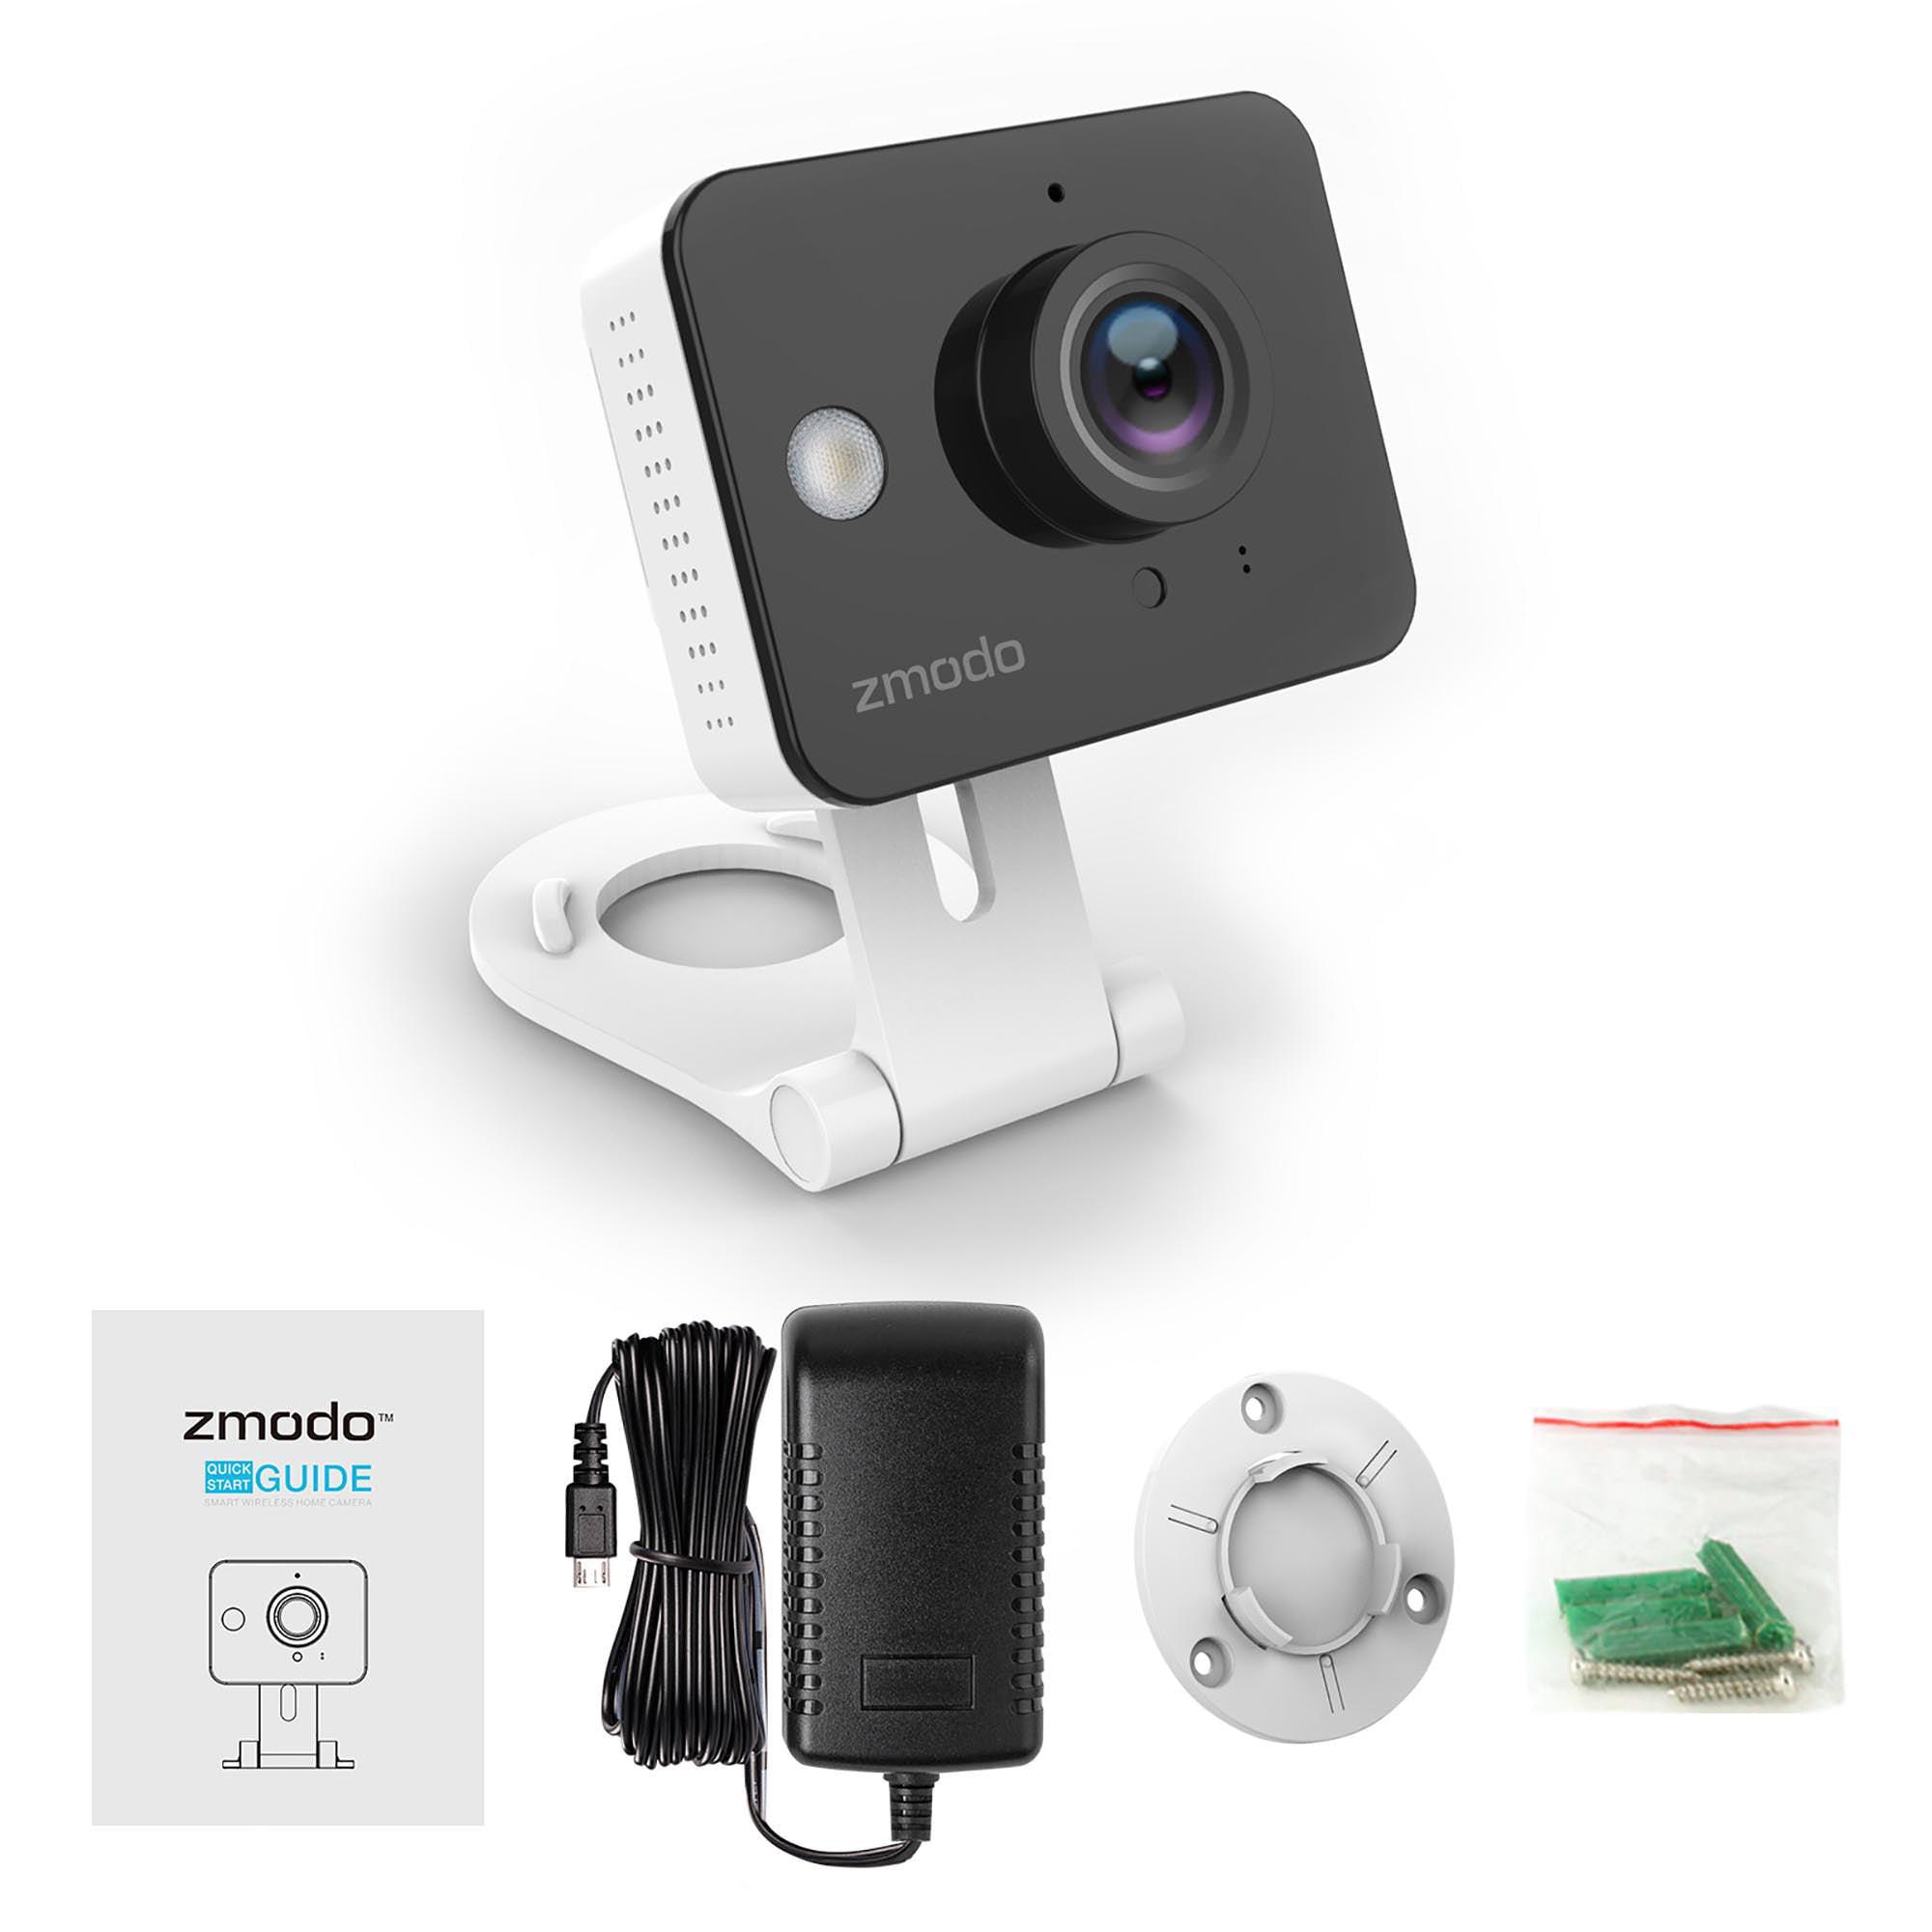 Zmodo 720P HD Mini WiFi Smart Security Camera Two Way Audio Night Vision    Free 6 Month Cloud Service   Walmart.com